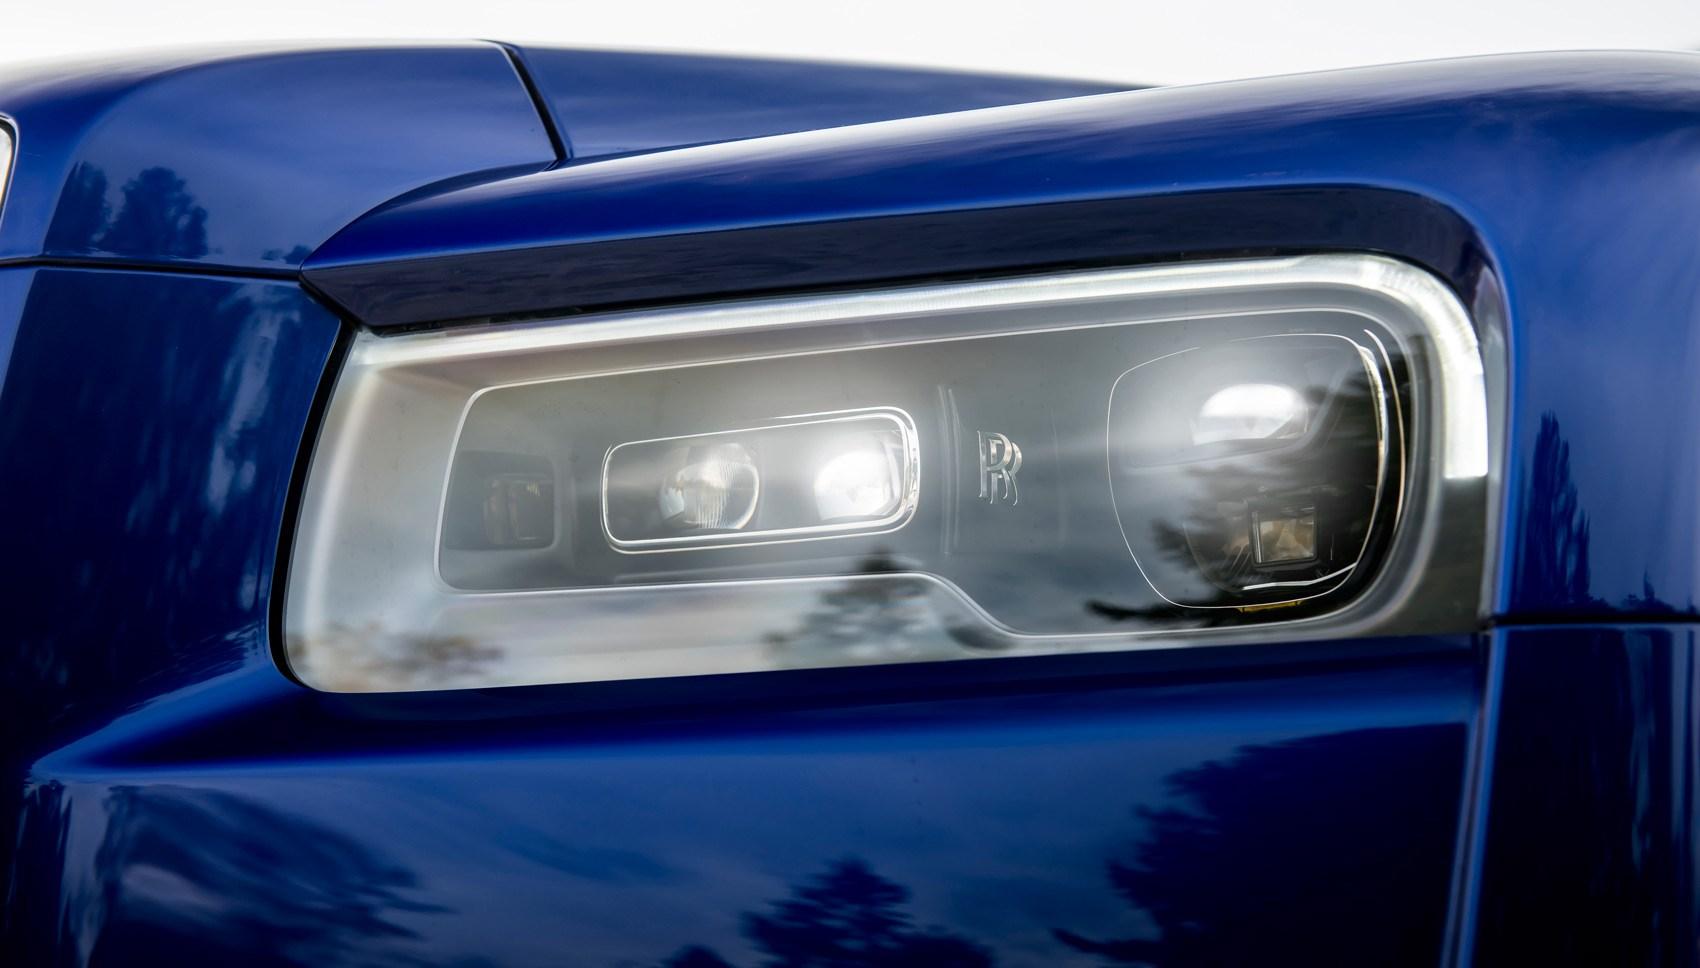 Rolls-Royce Cullinan headlights